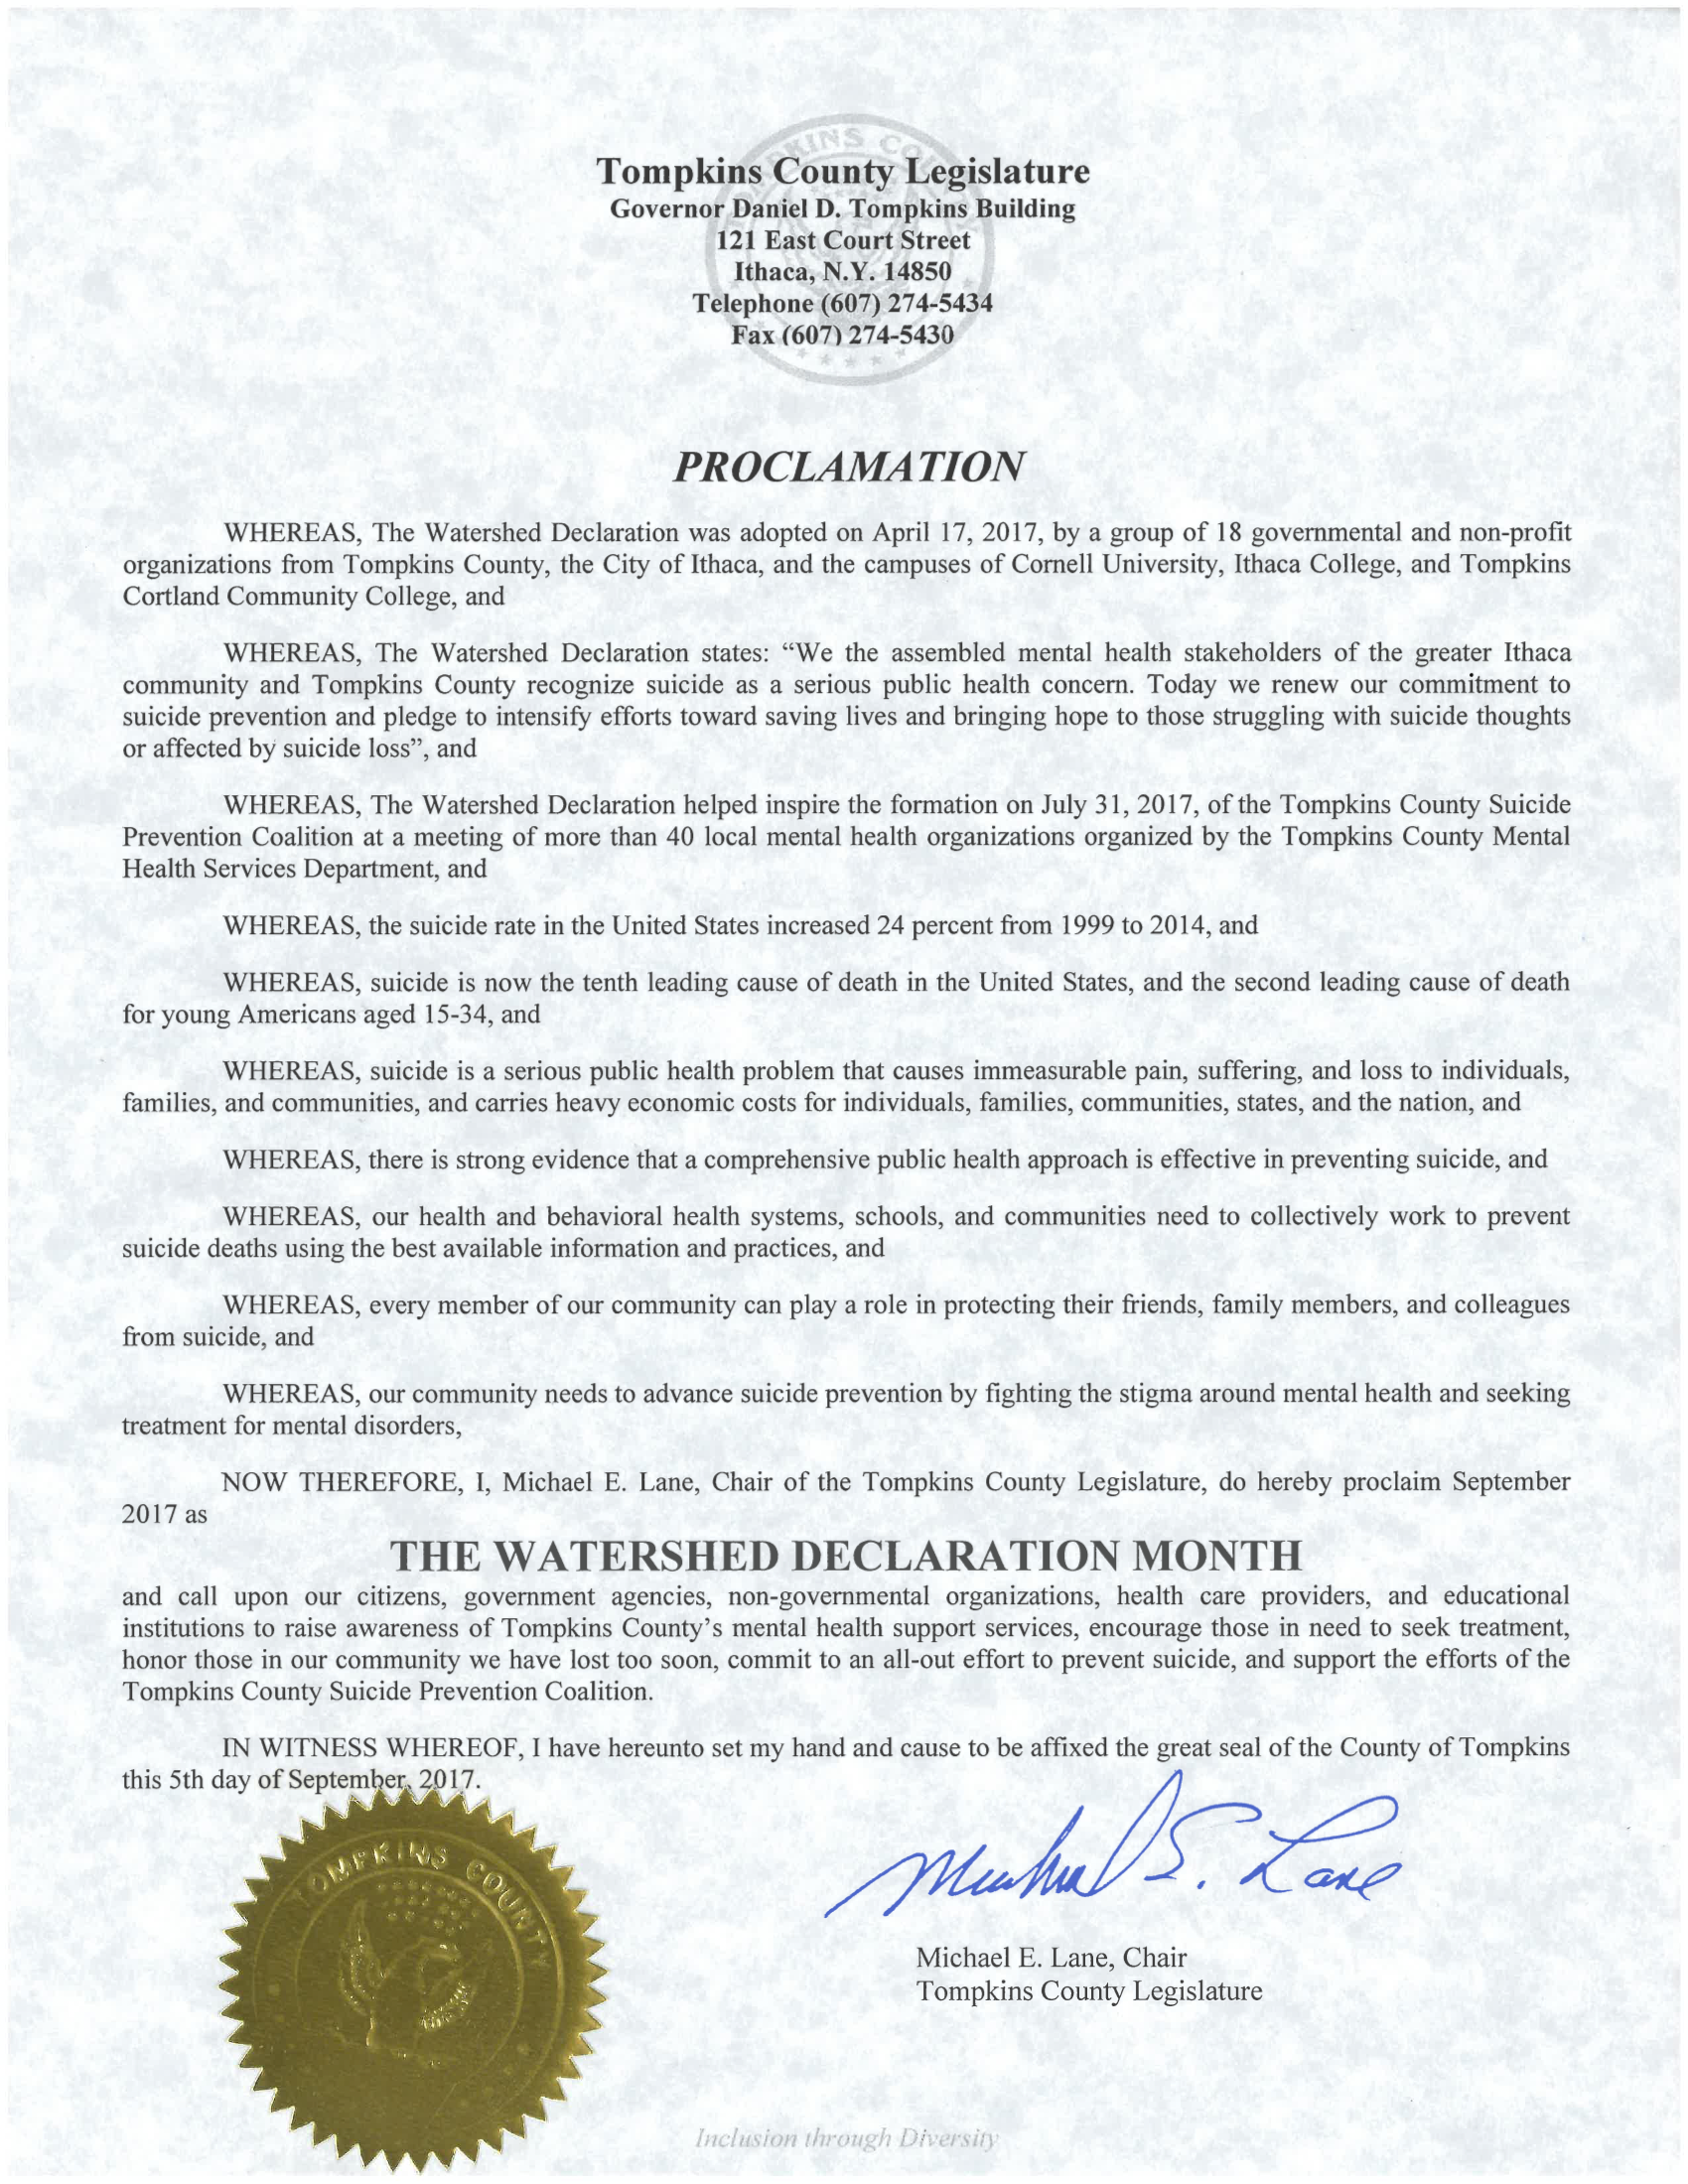 New york tompkins county ithaca 14850 - Tompkins County Legislature Proclamation